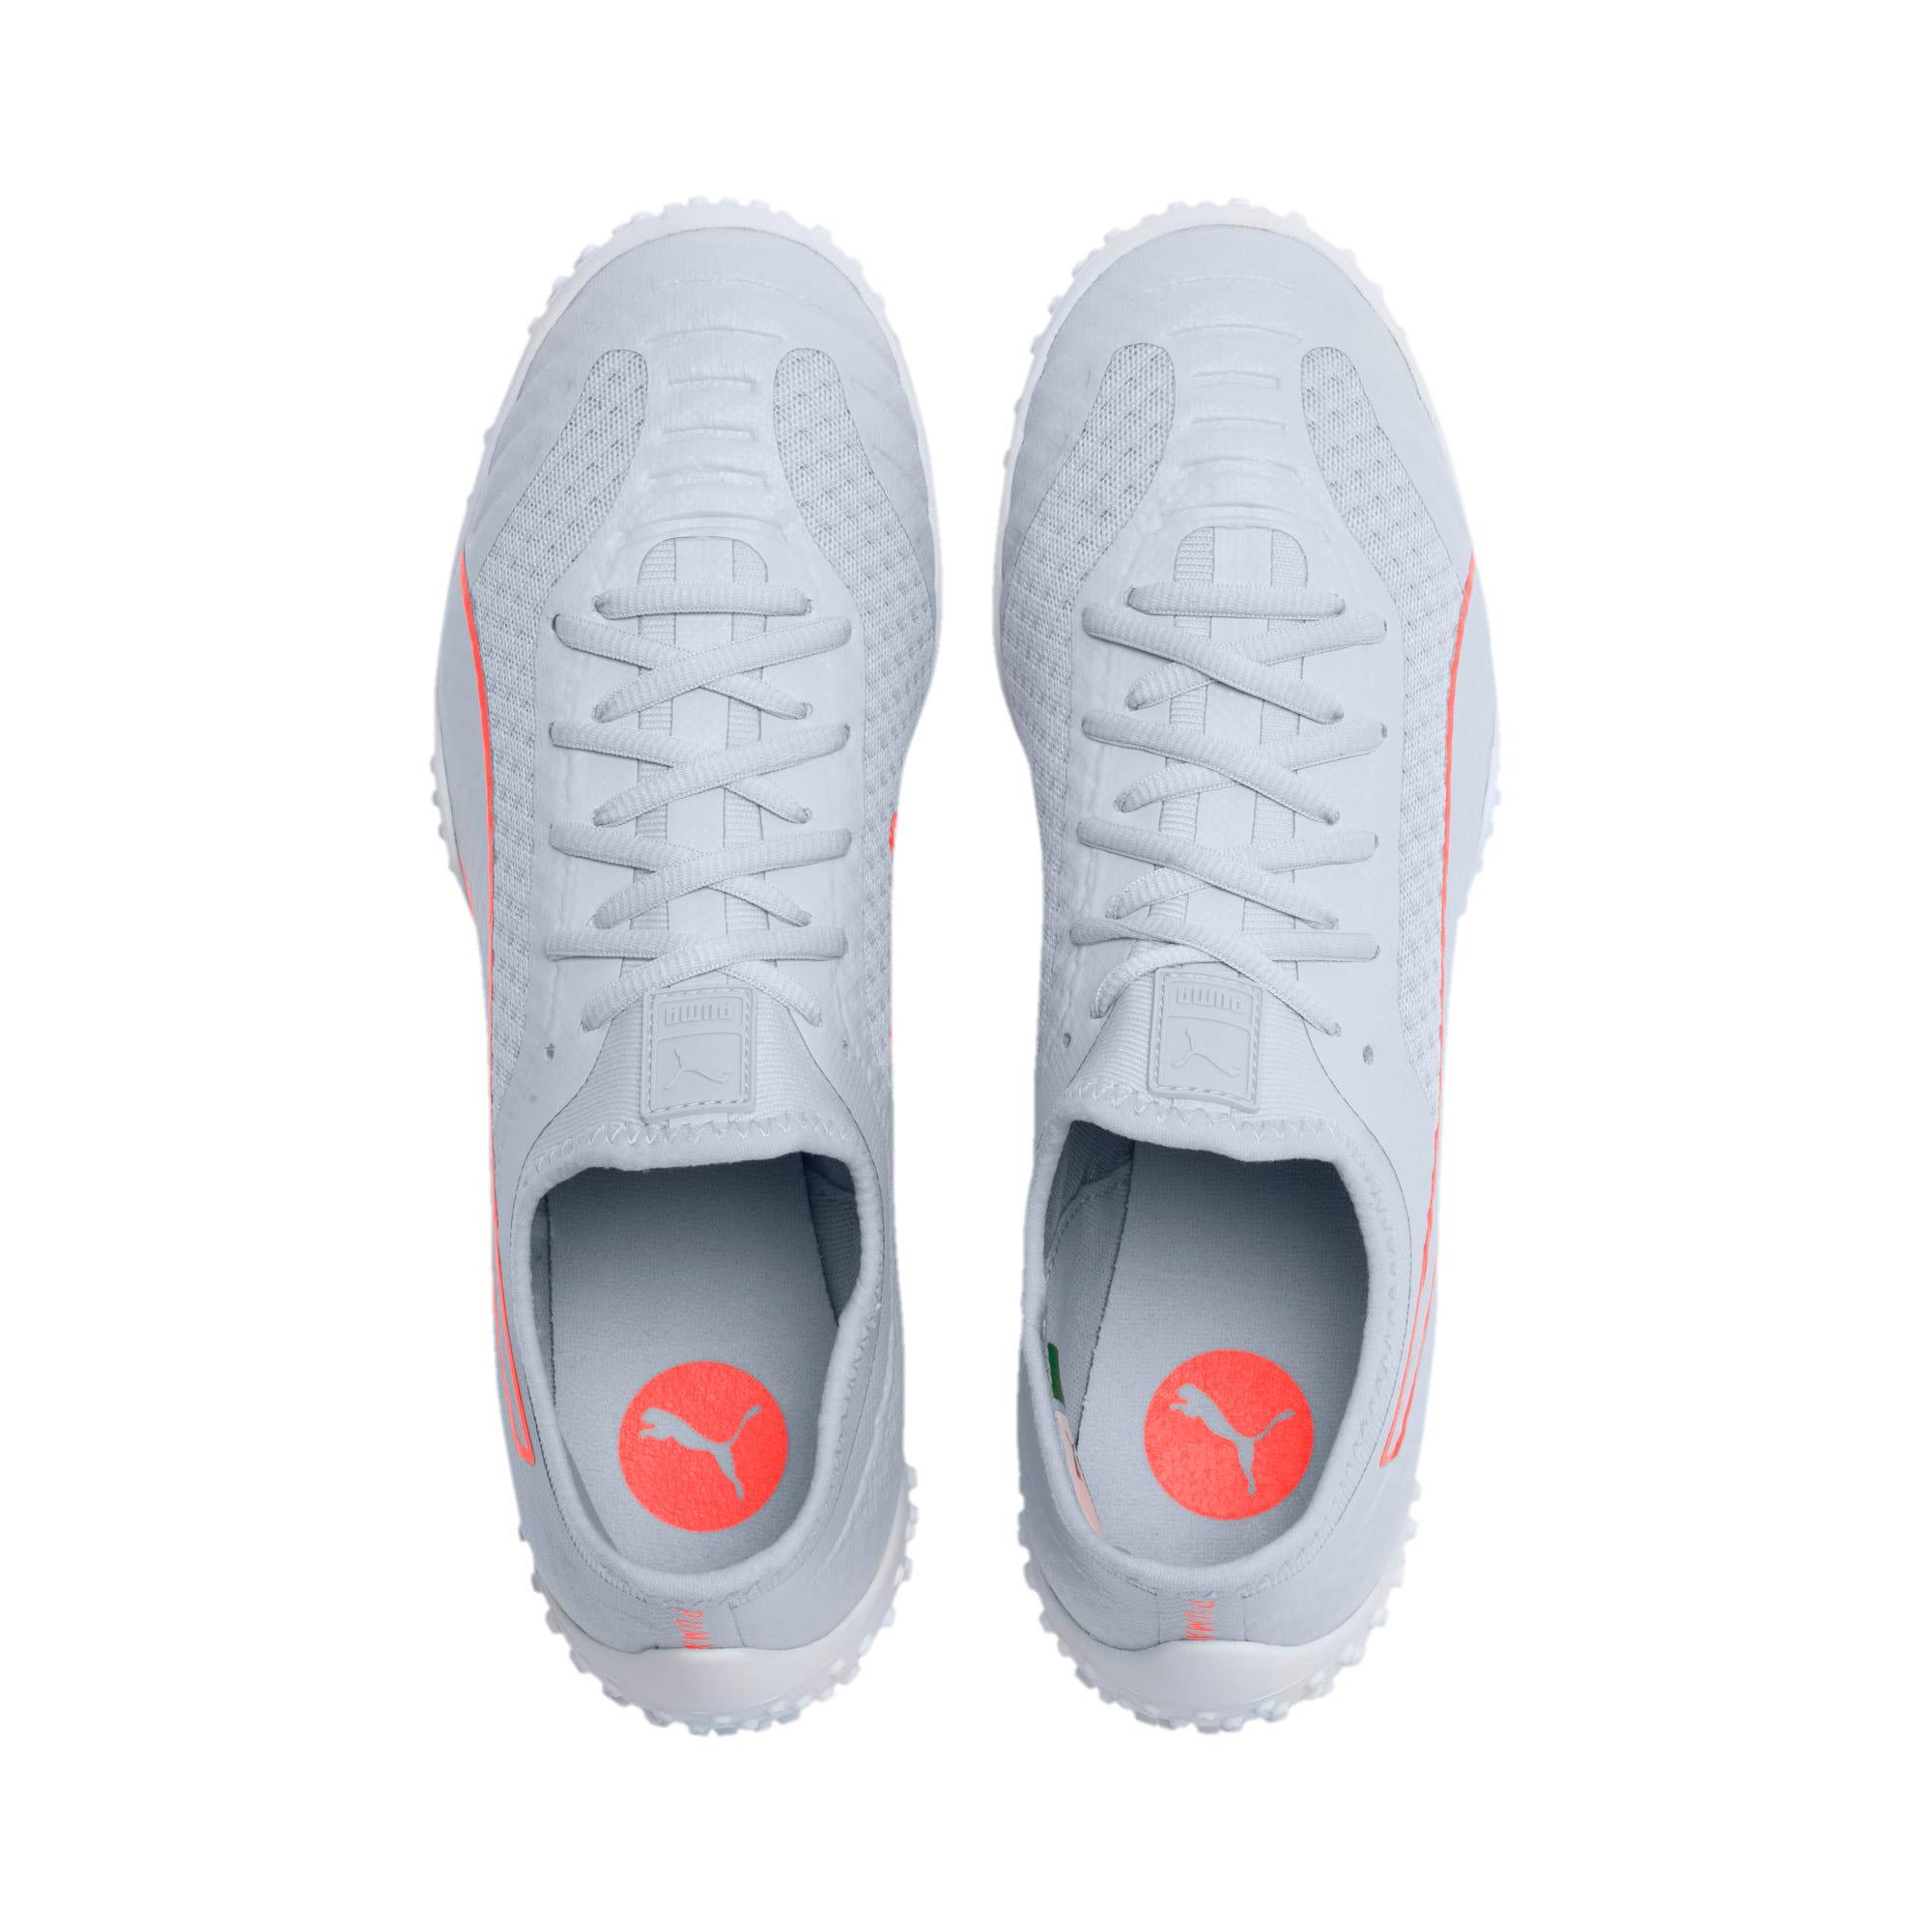 Thumbnail 7 of 365 Concrete 2 ST Men's Soccer Shoes, Grey Dawn-Nrgy Red-White, medium